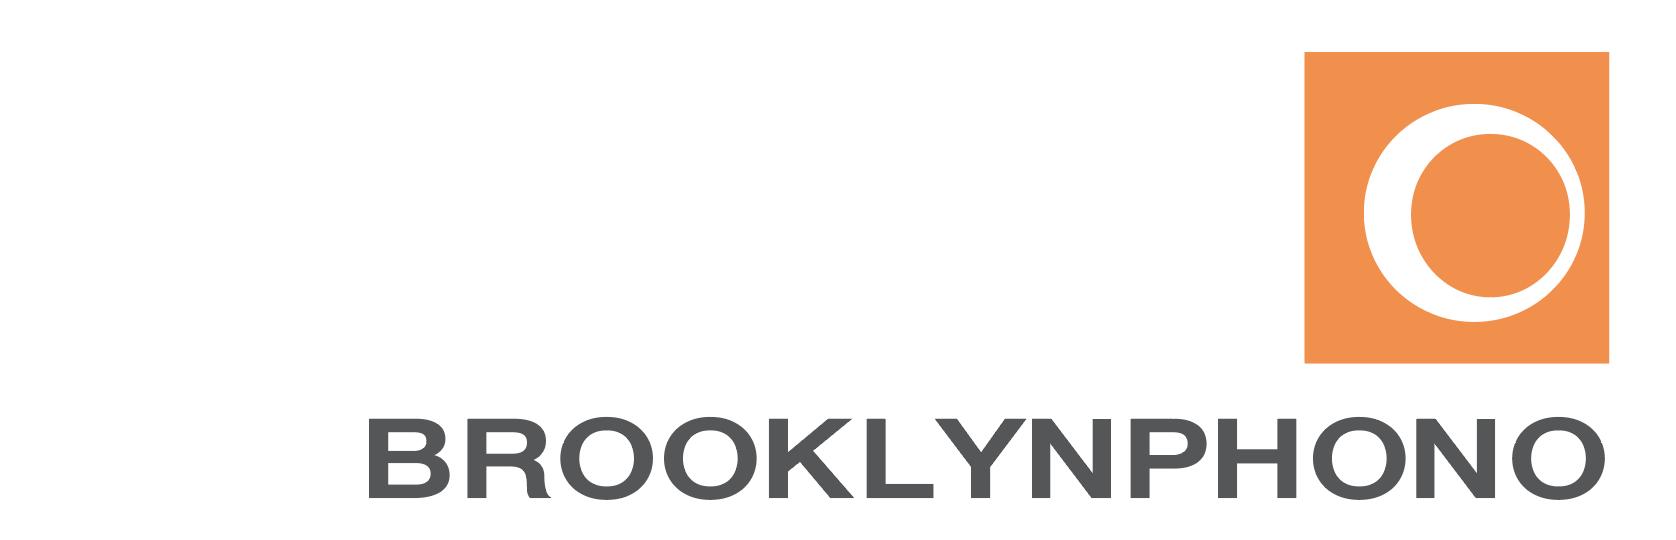 Brooklynphono